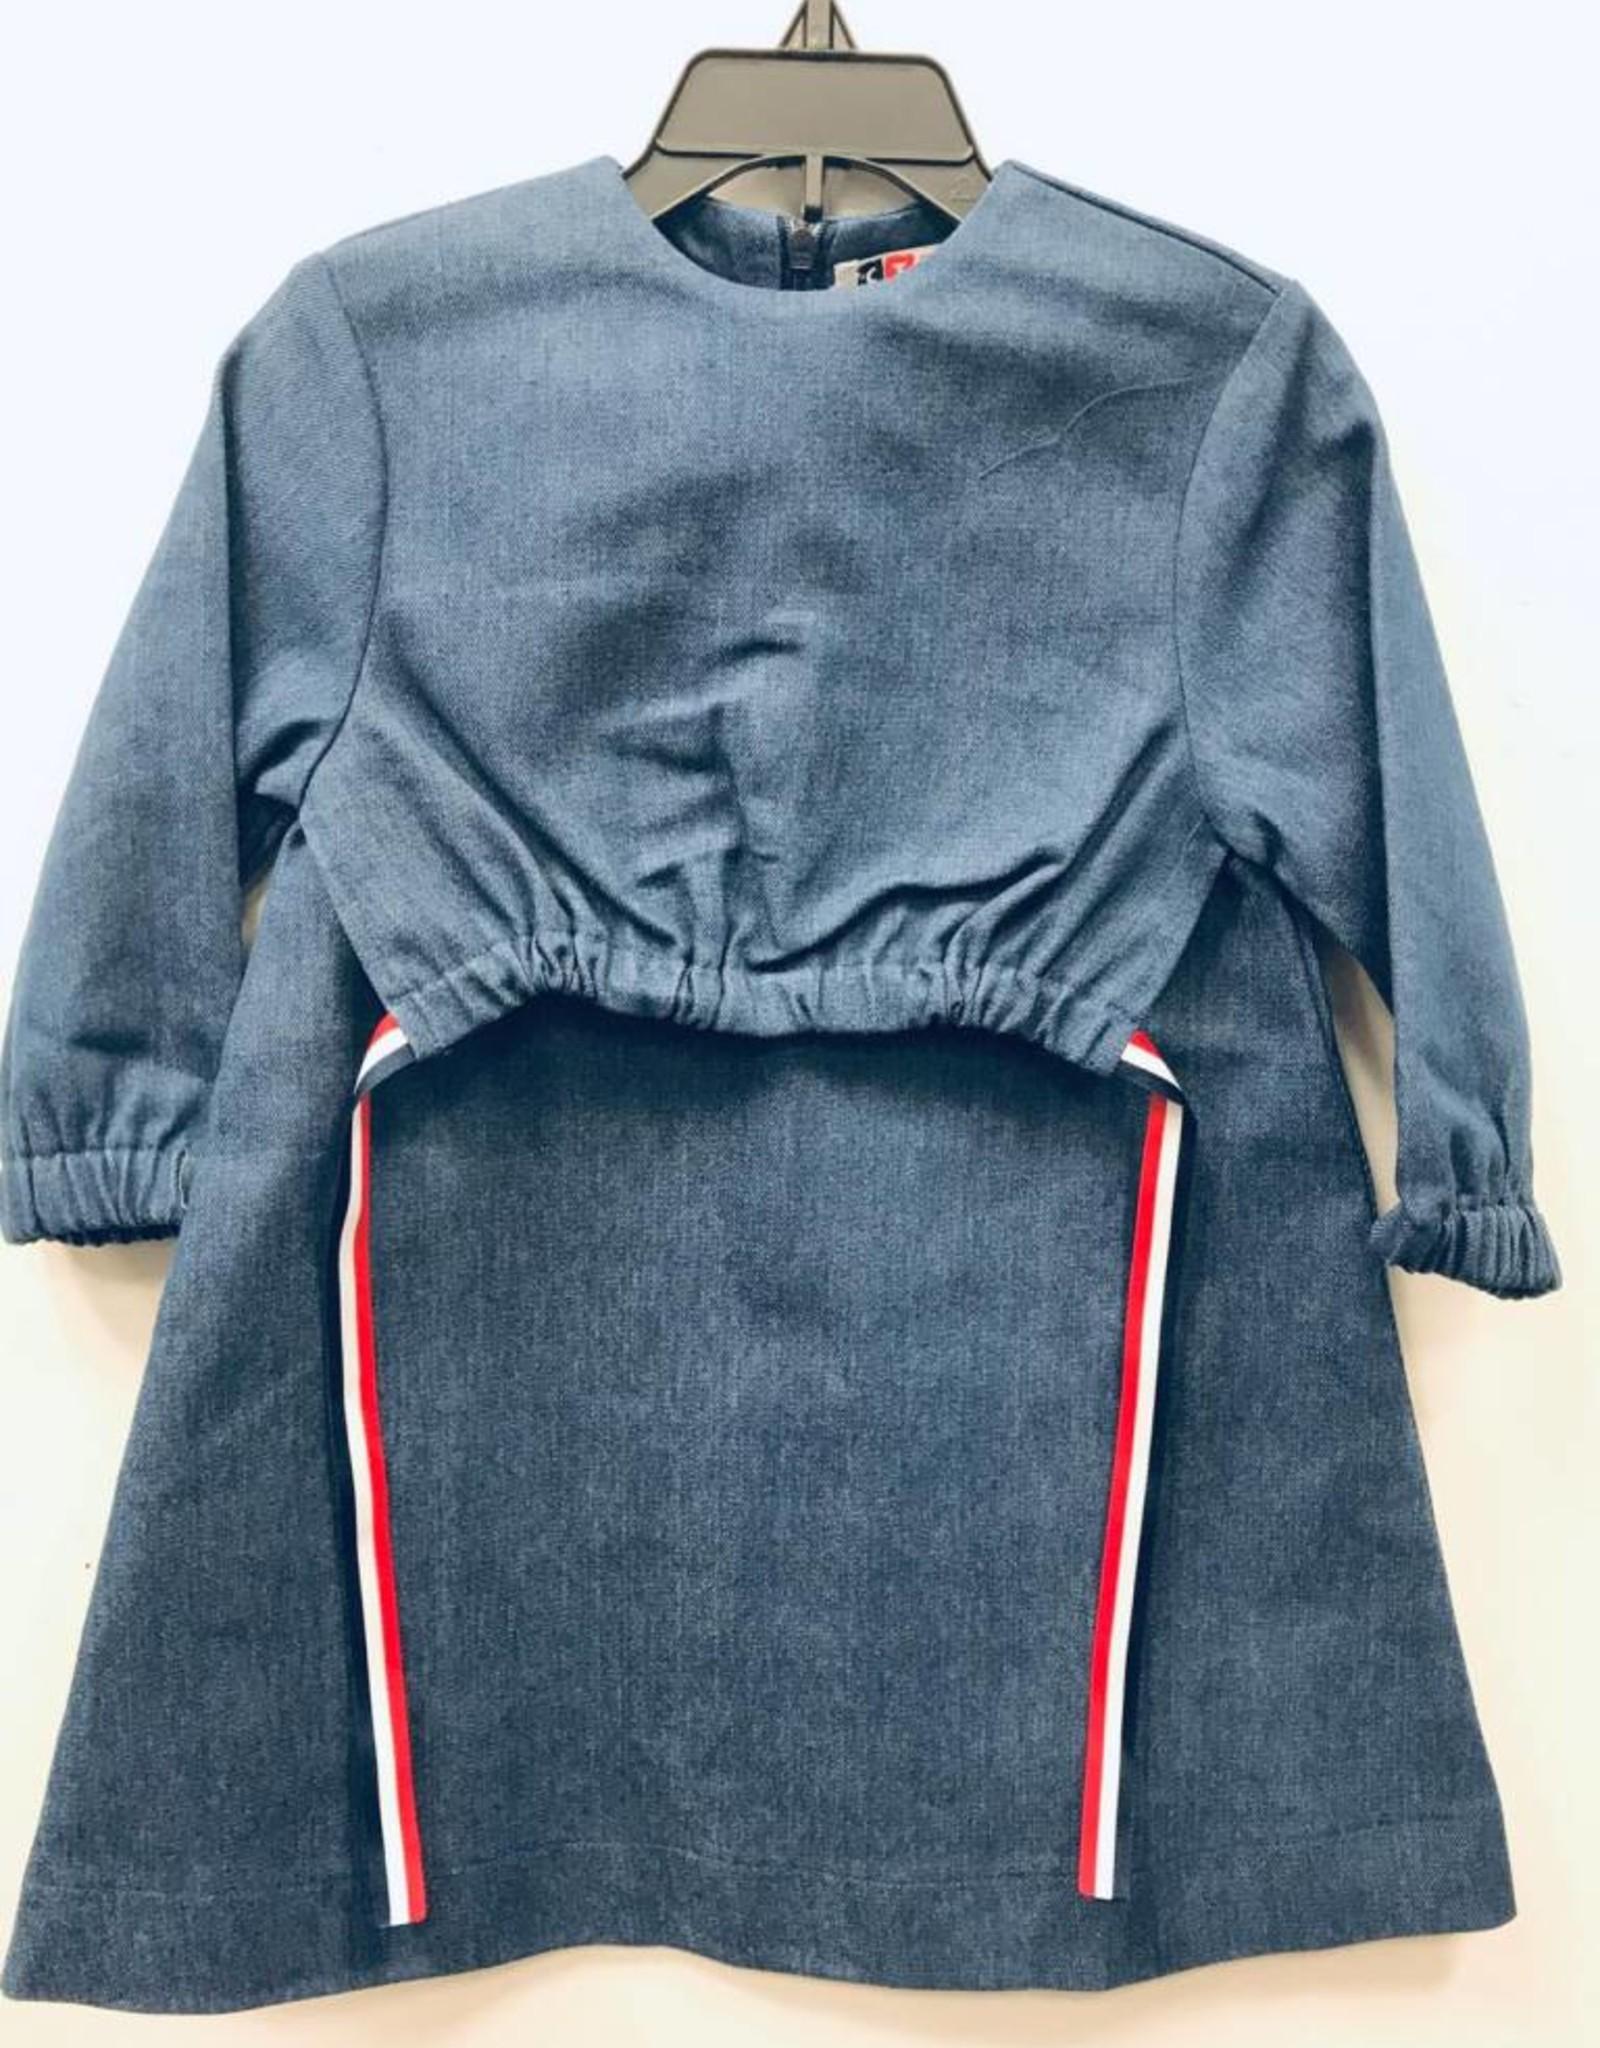 C.T.N. C.T.N. Arch Ribbons Dress